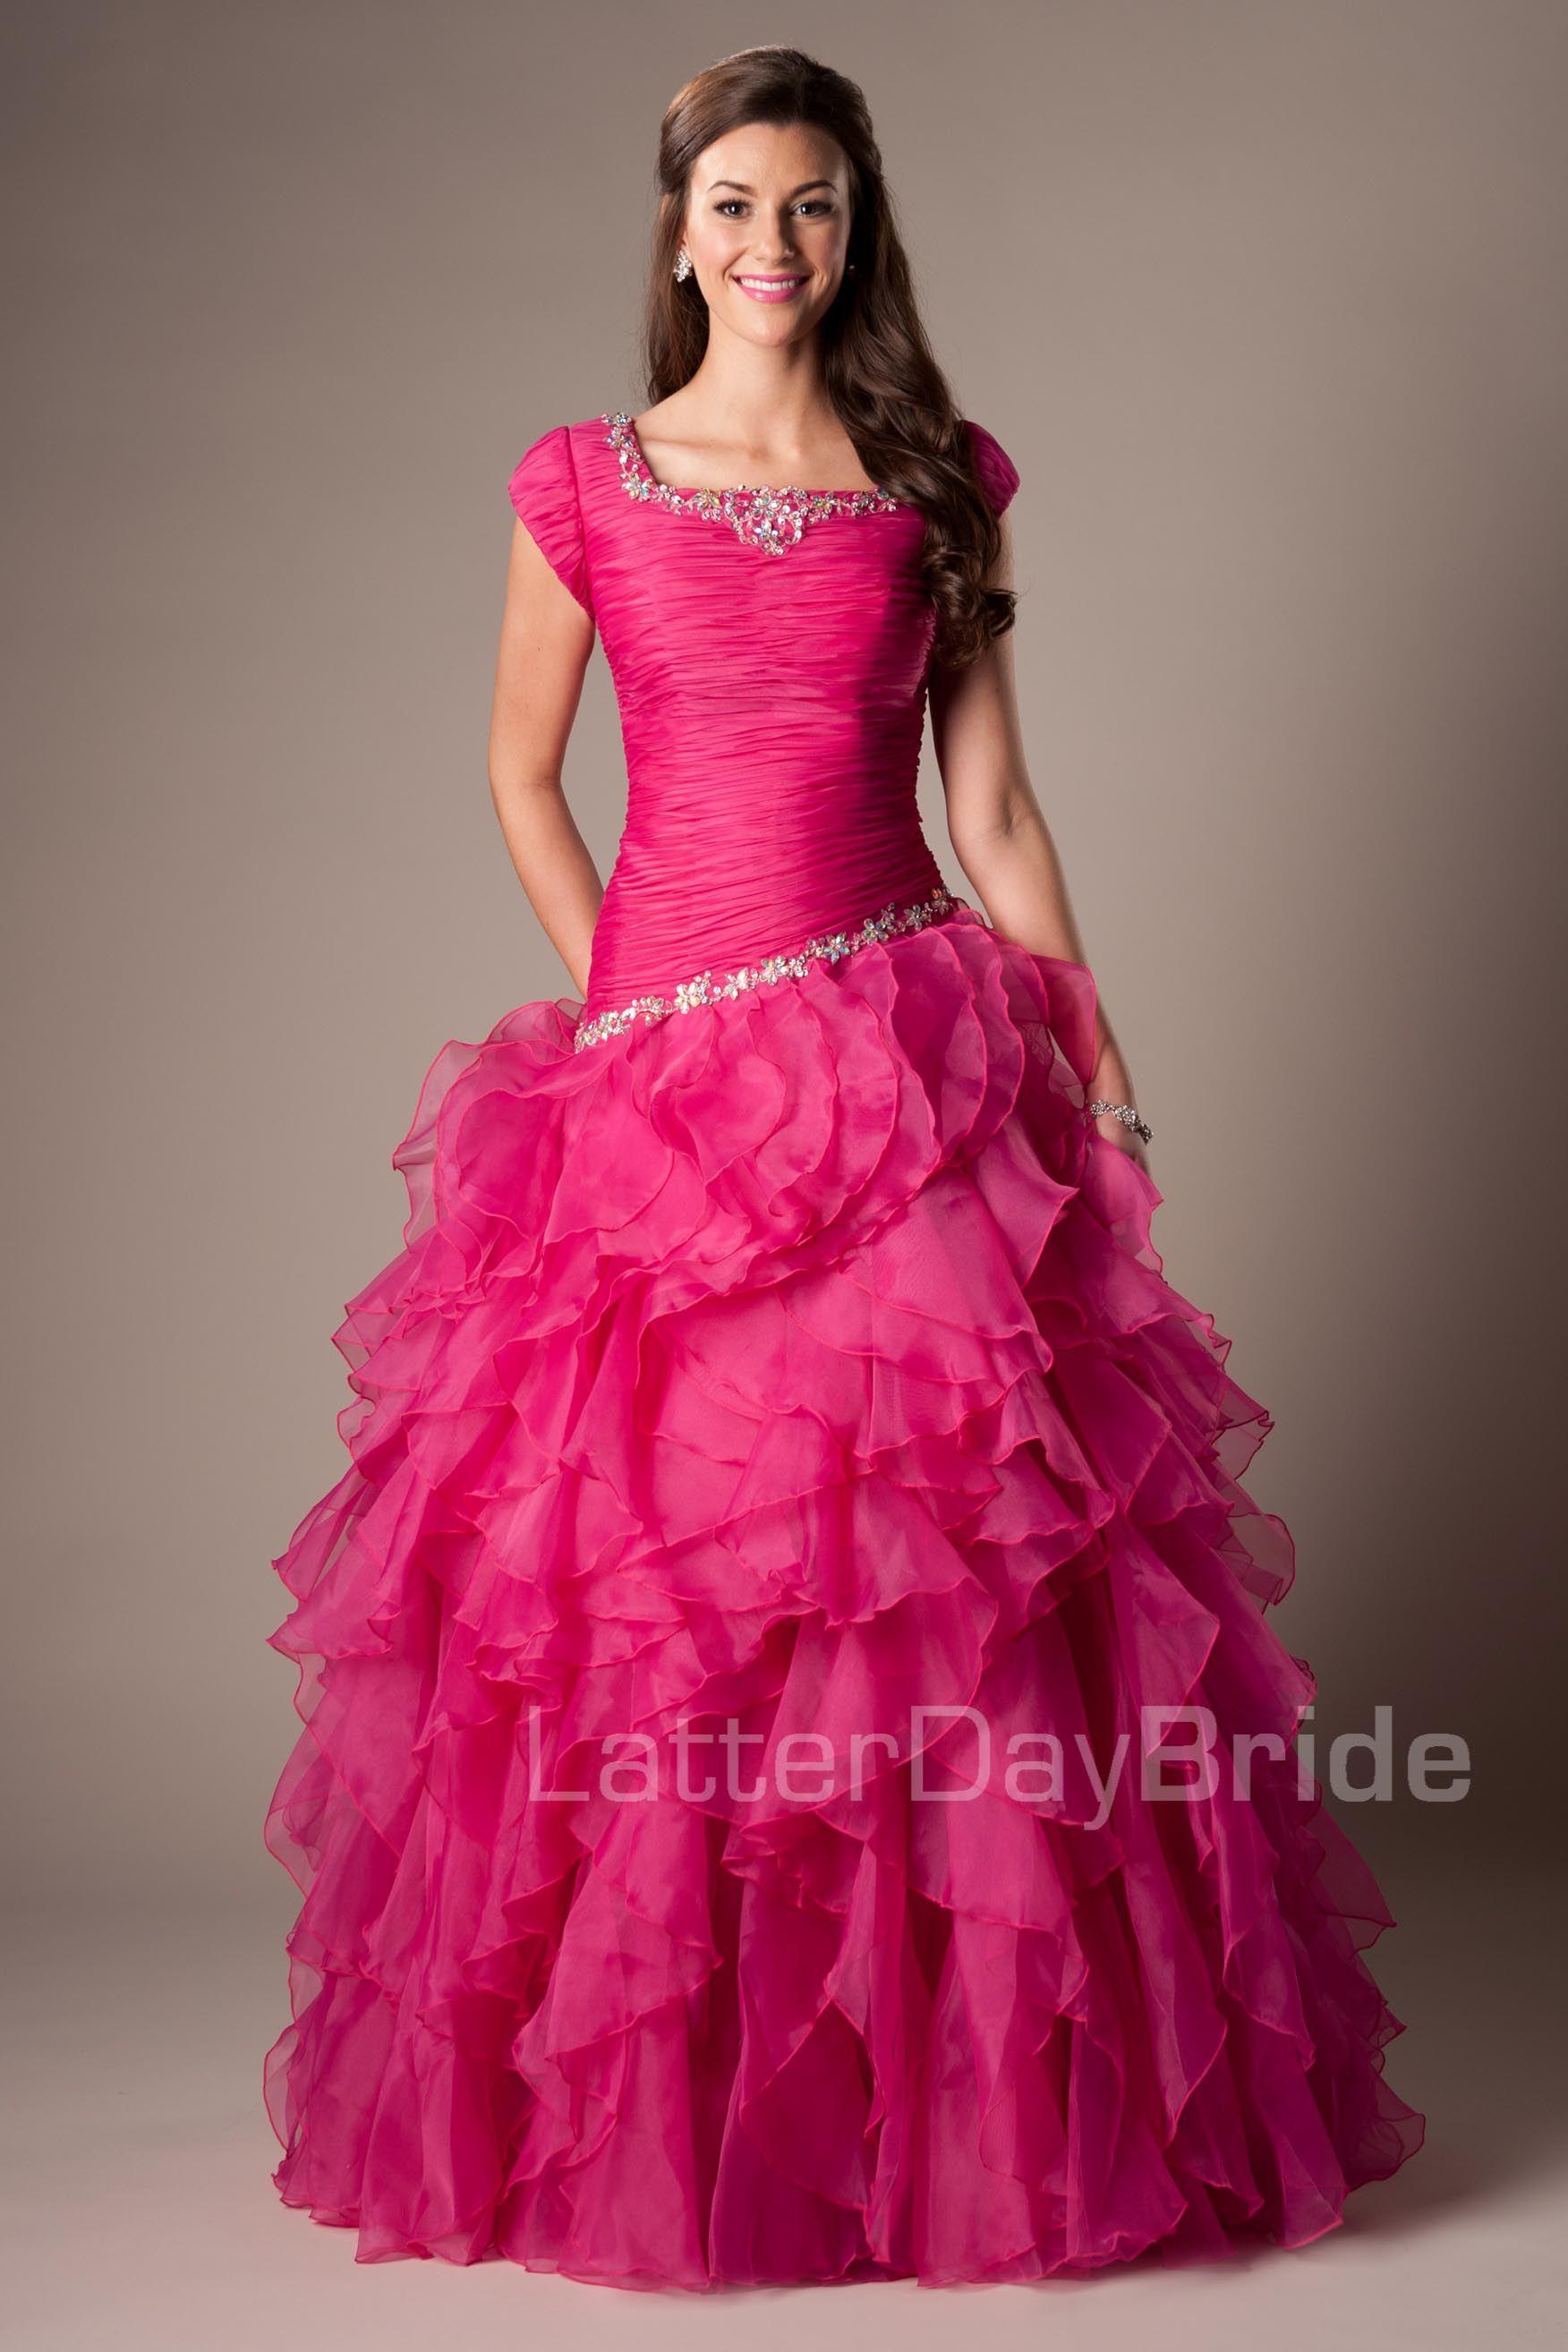 Encantador Vestidos De Boda Modesta En Utah Componente - Colección ...